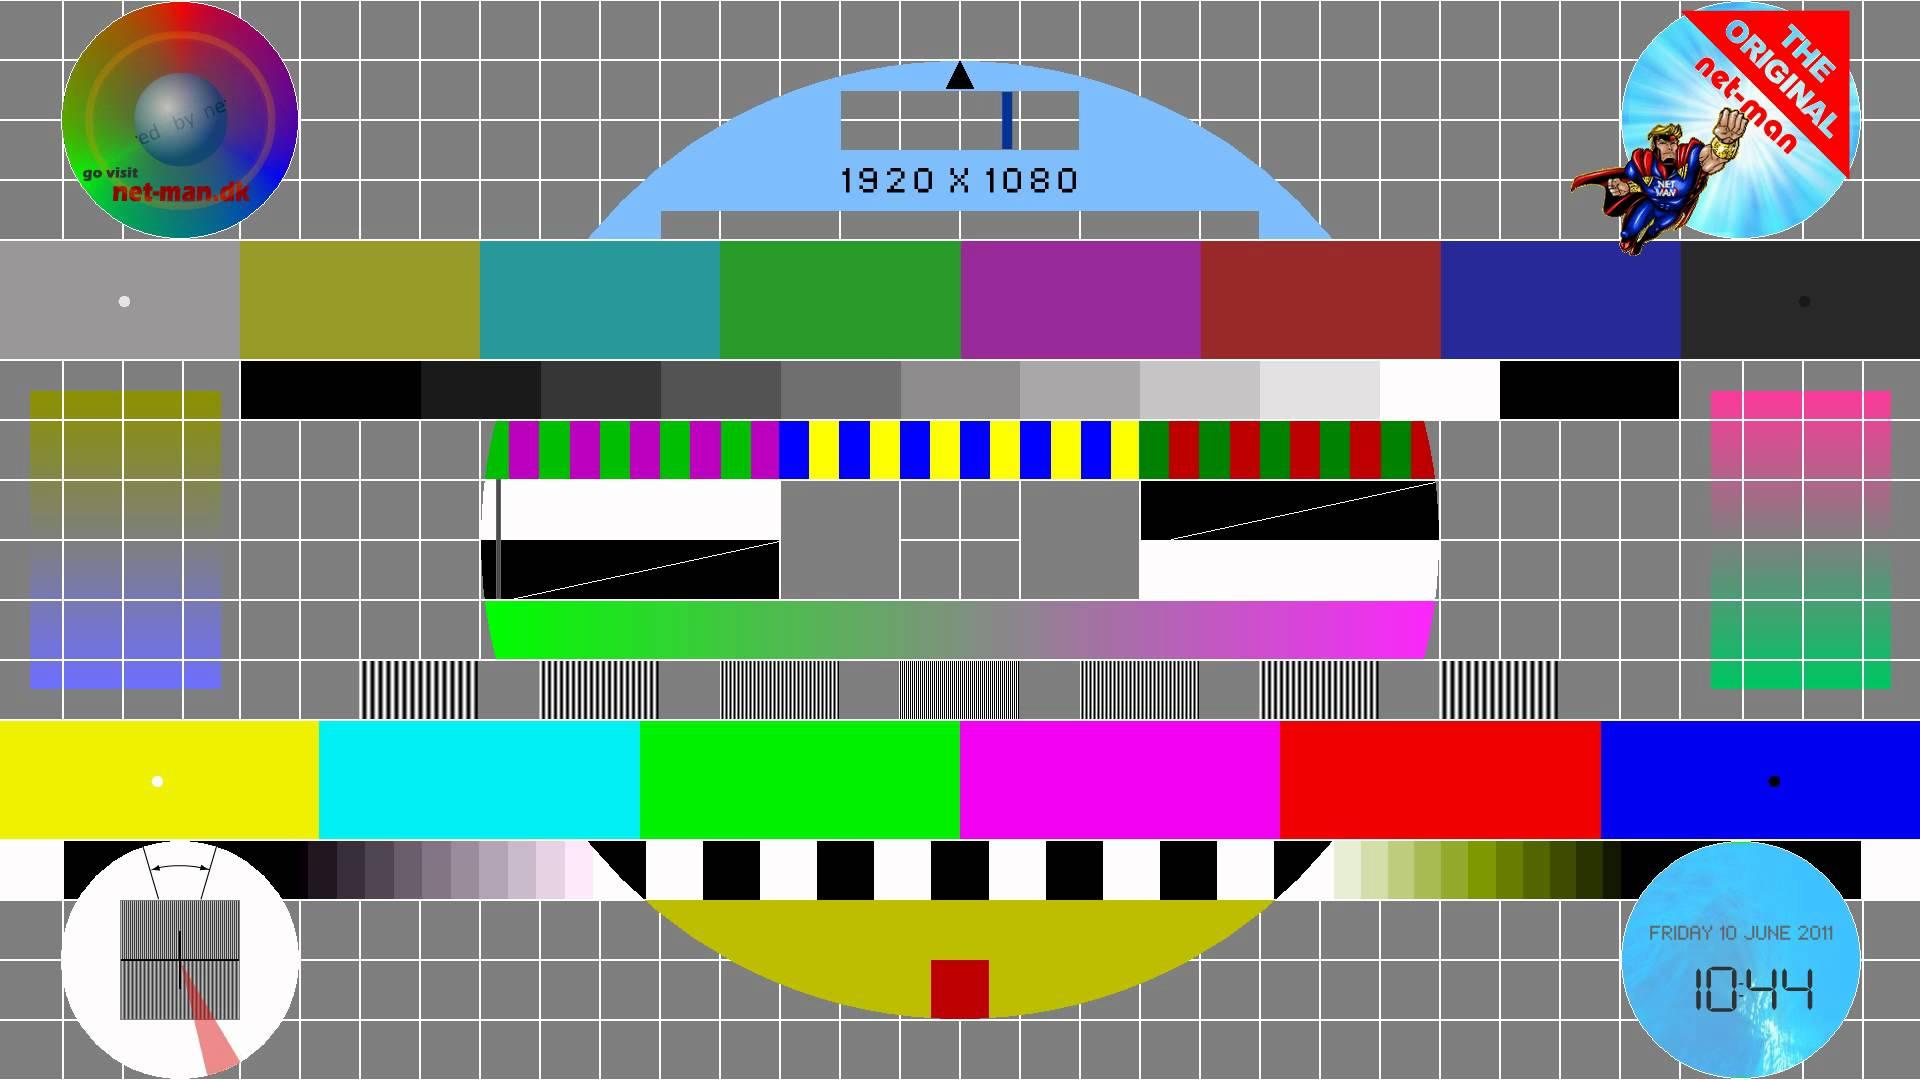 Test pattern & monitor calibration chart - YouTube